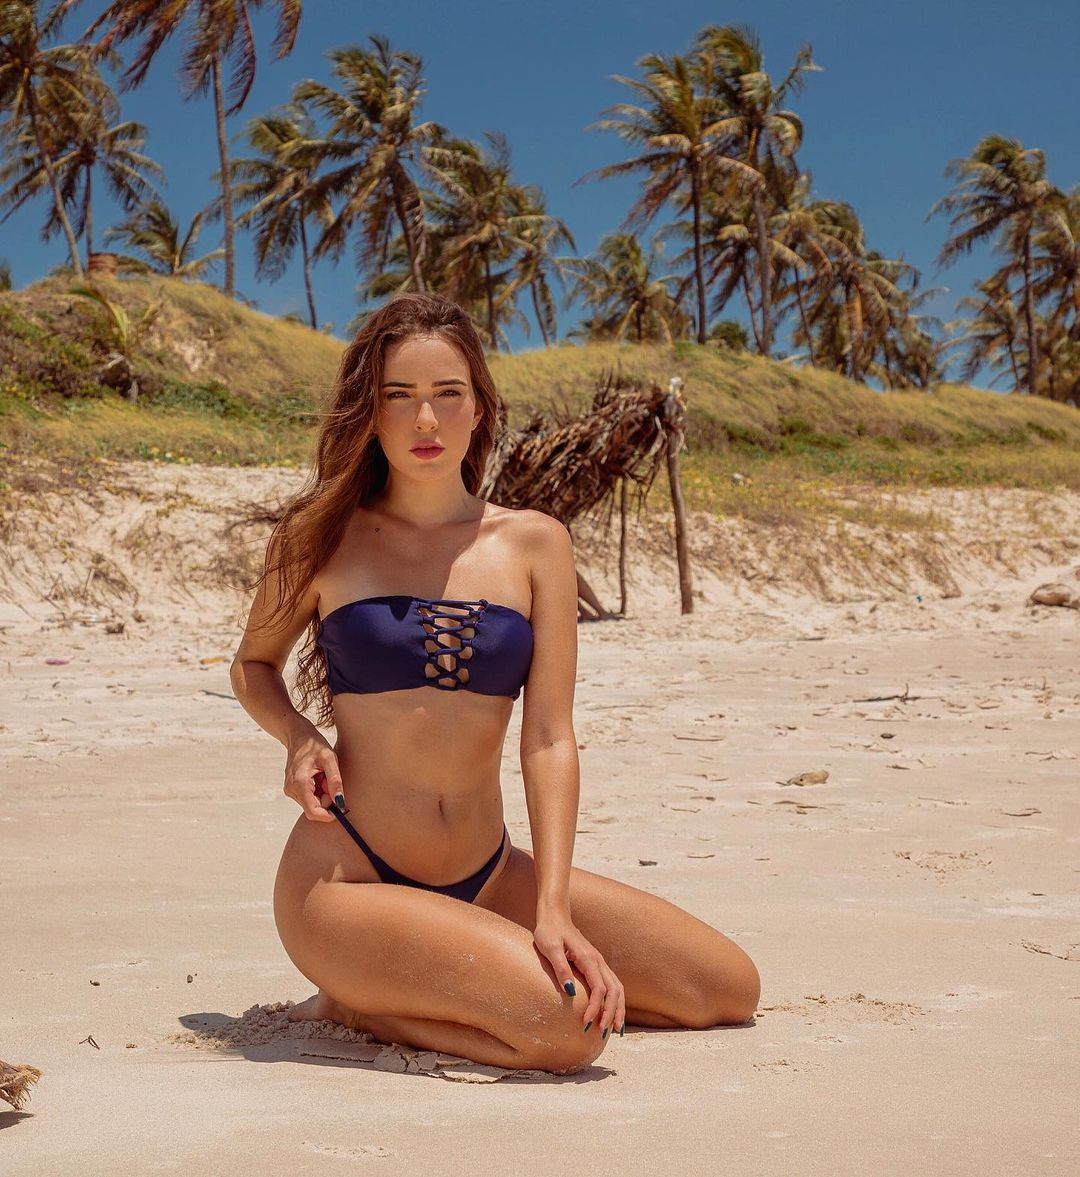 anne karoline lisboa, miss simpatia de miss brasil mundo 2019. 13264919